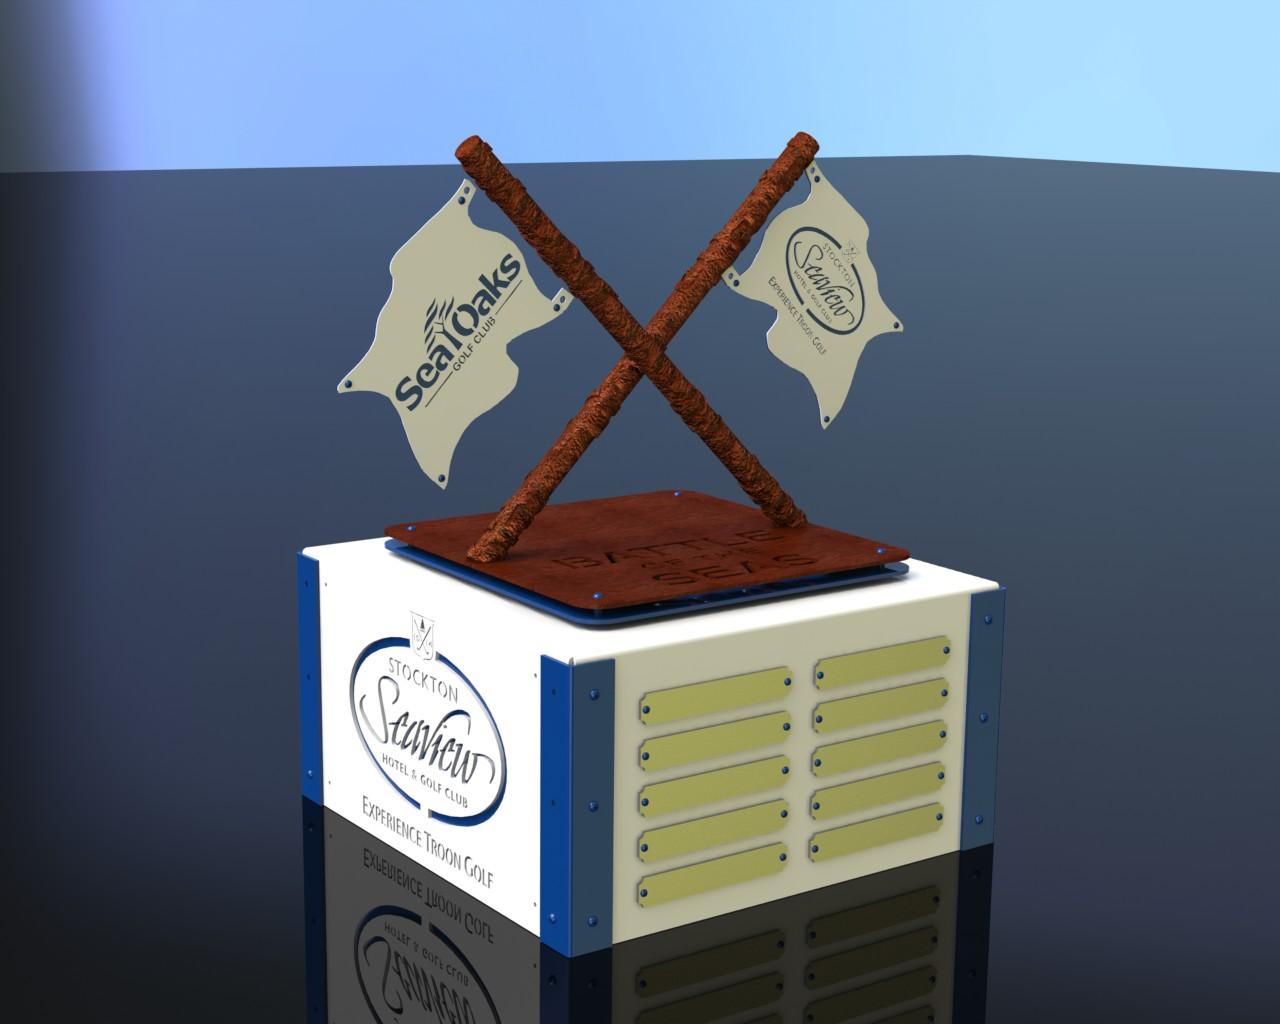 Battle of the Seas Perpetual Trophy